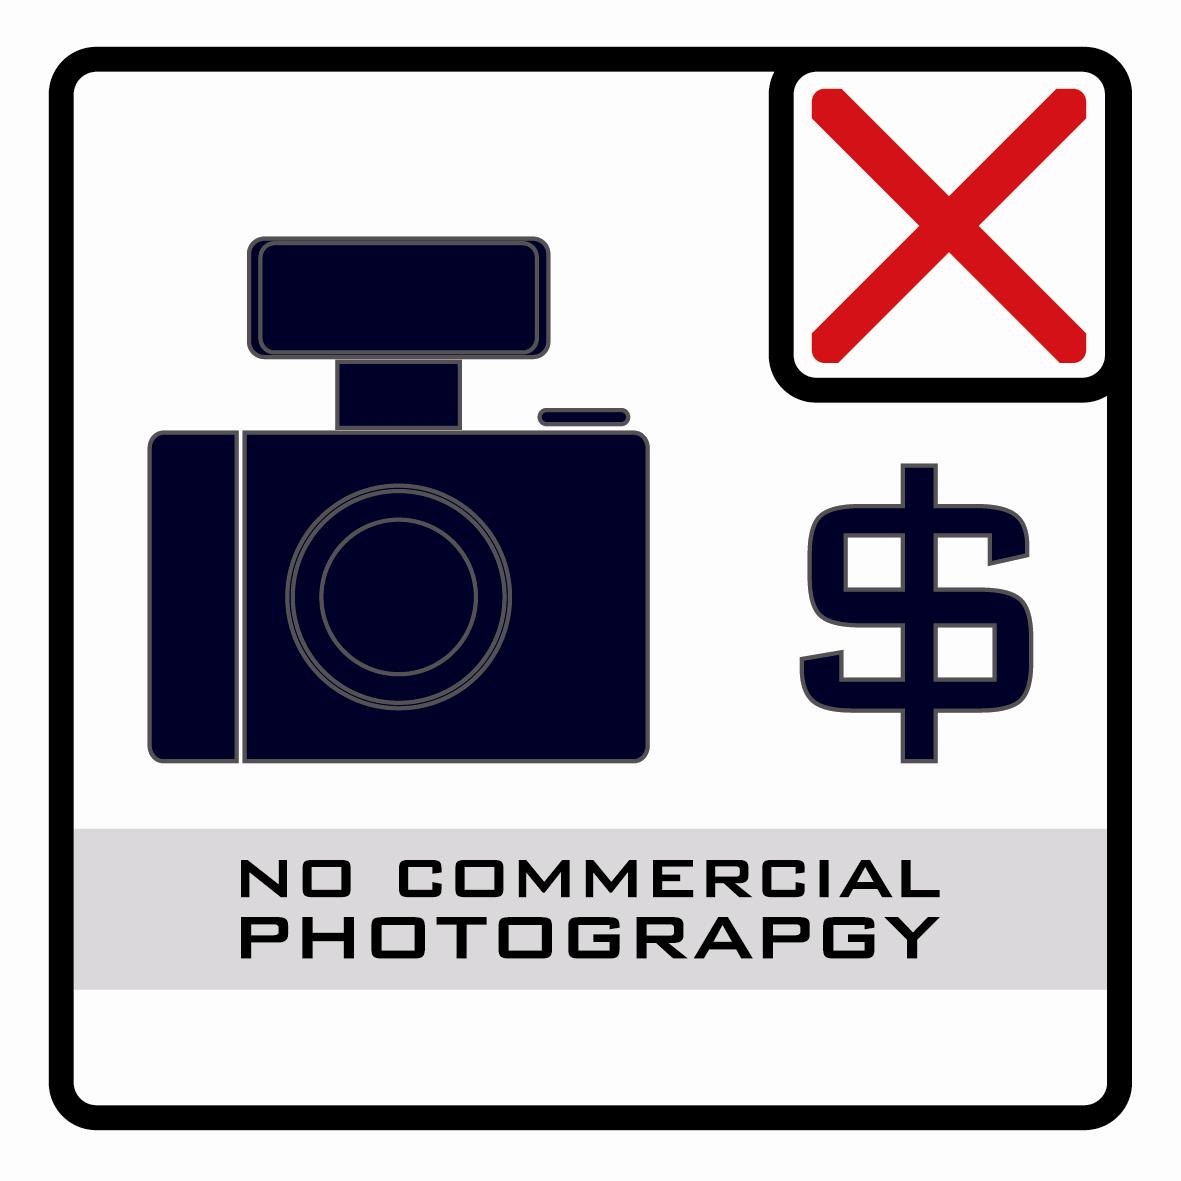 【icon】禁止商業攝影